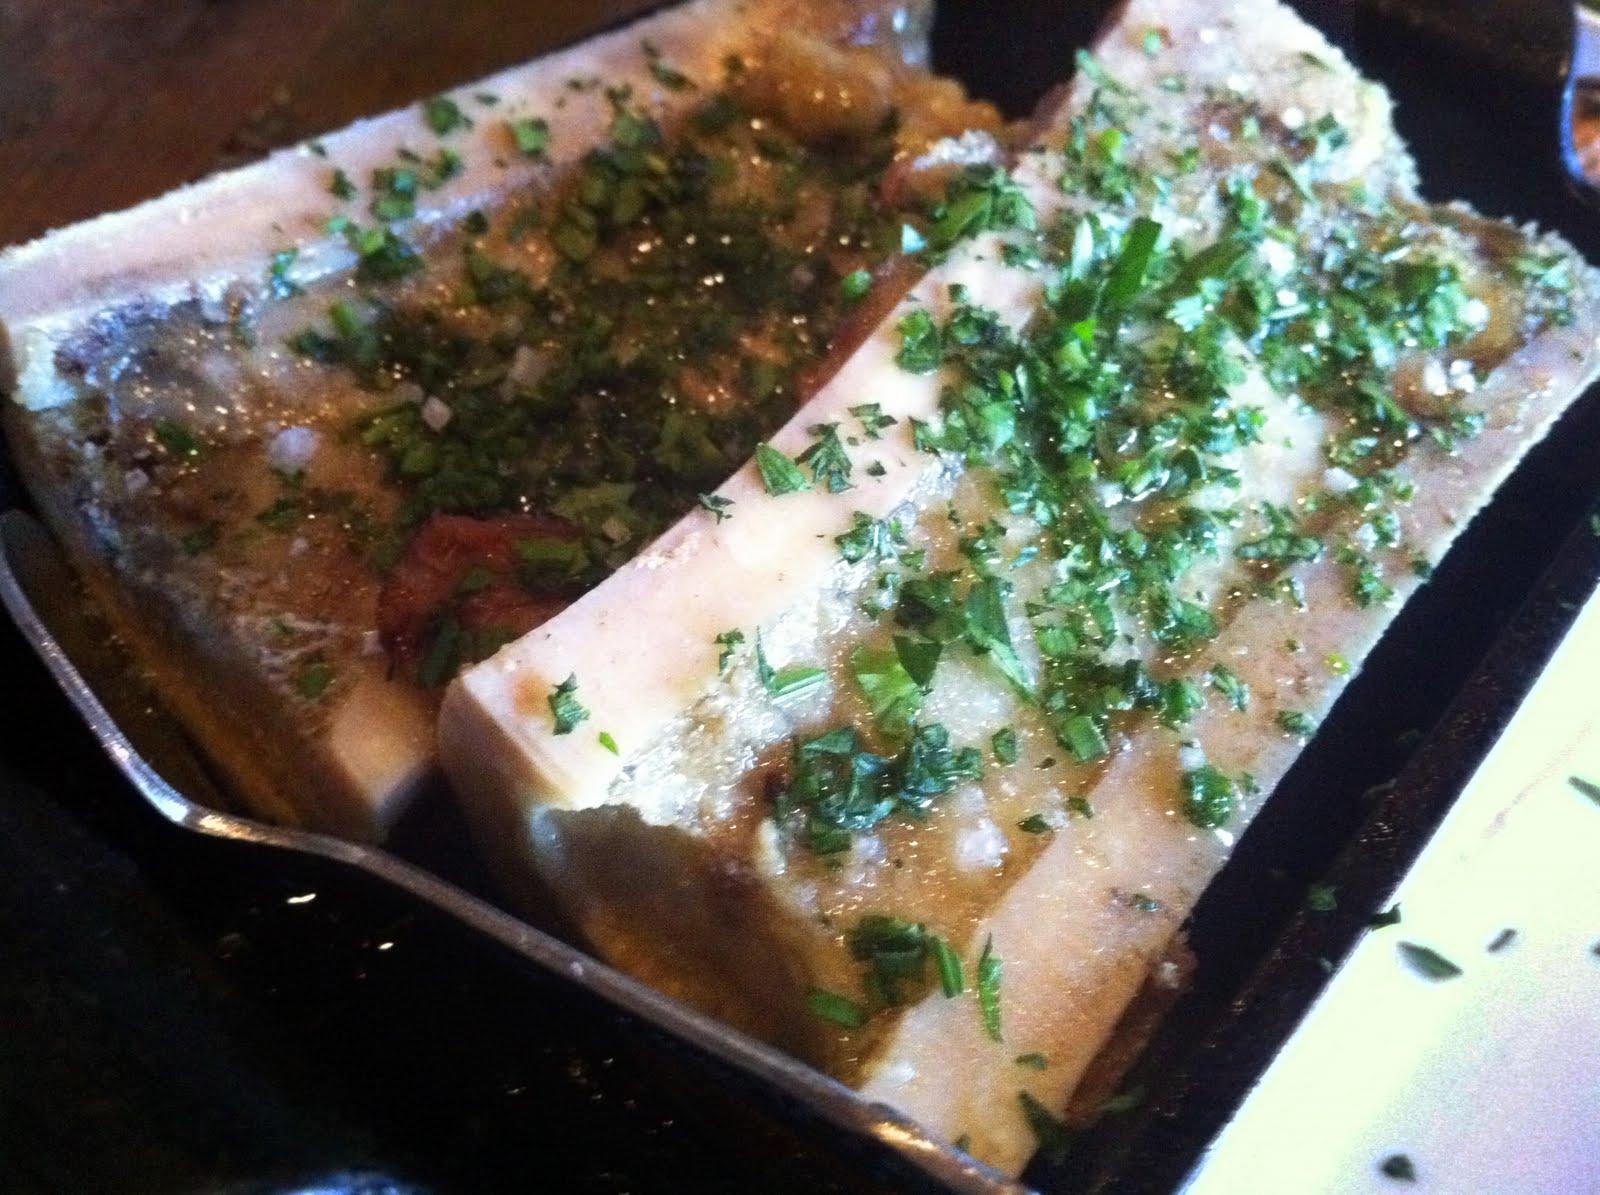 Roasted bone marrow with salsa verde & herbs (from Marlowe ):